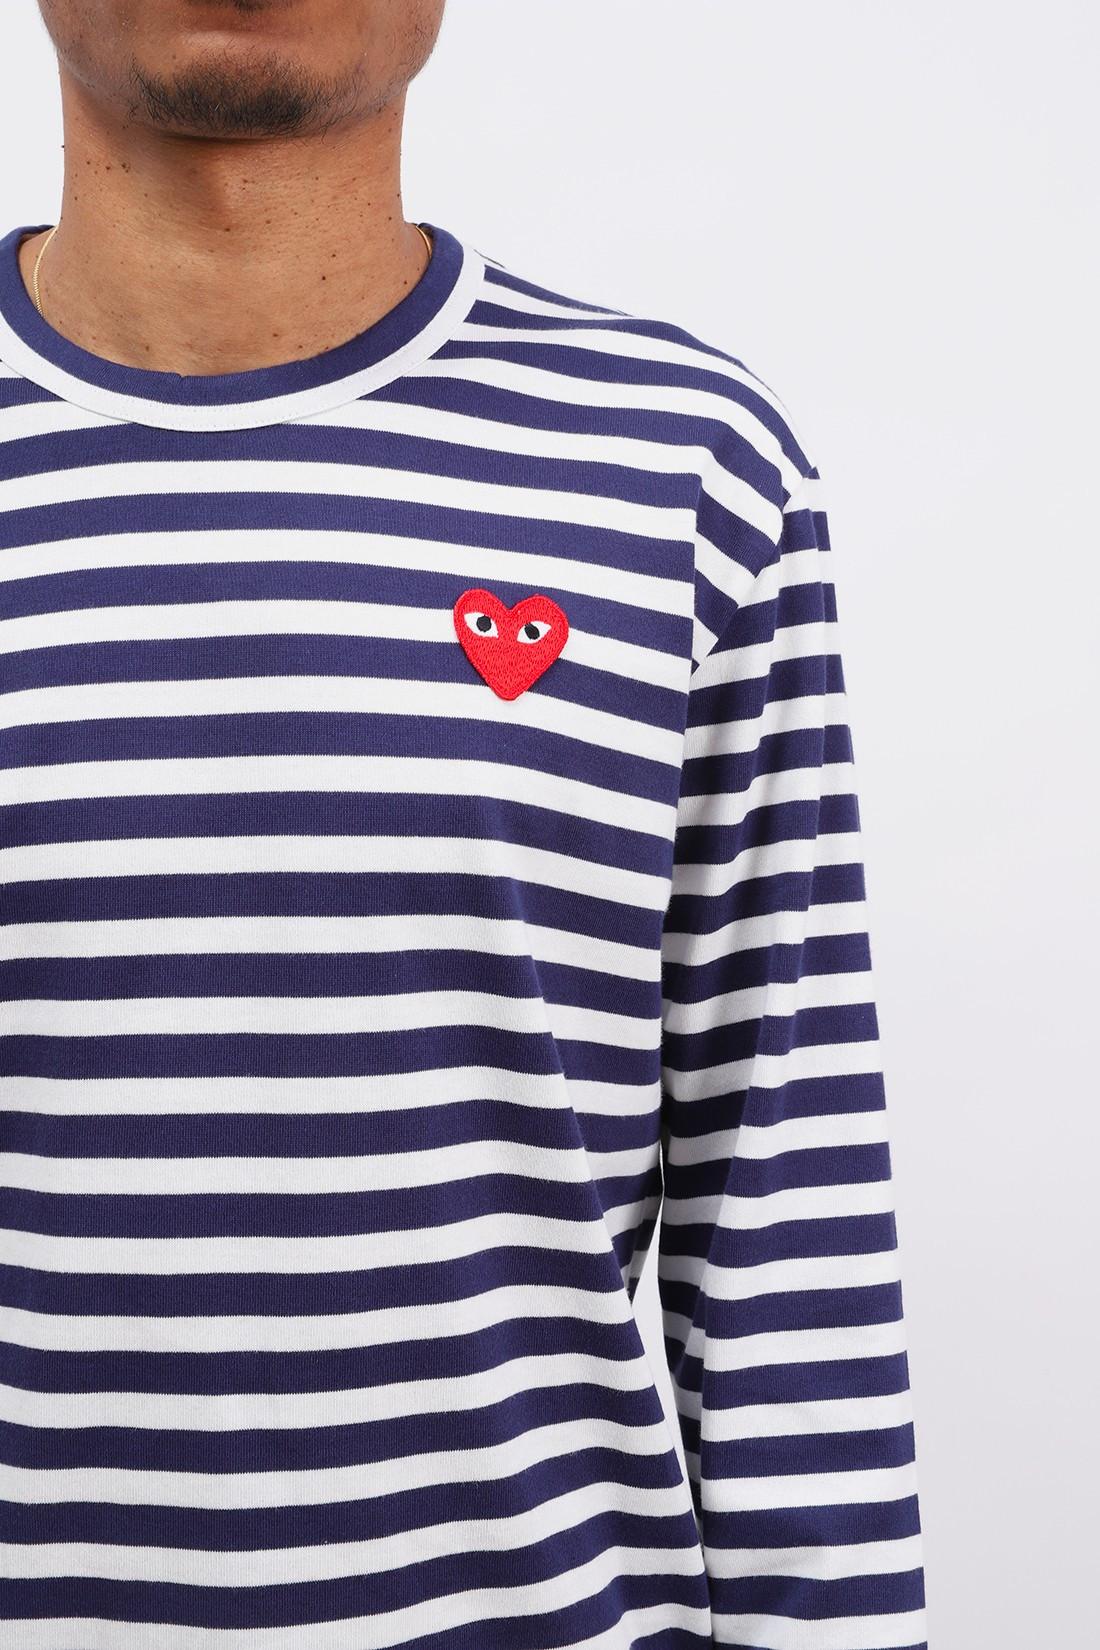 COMME DES GARÇONS PLAY / Play striped t-shirt Navy / white